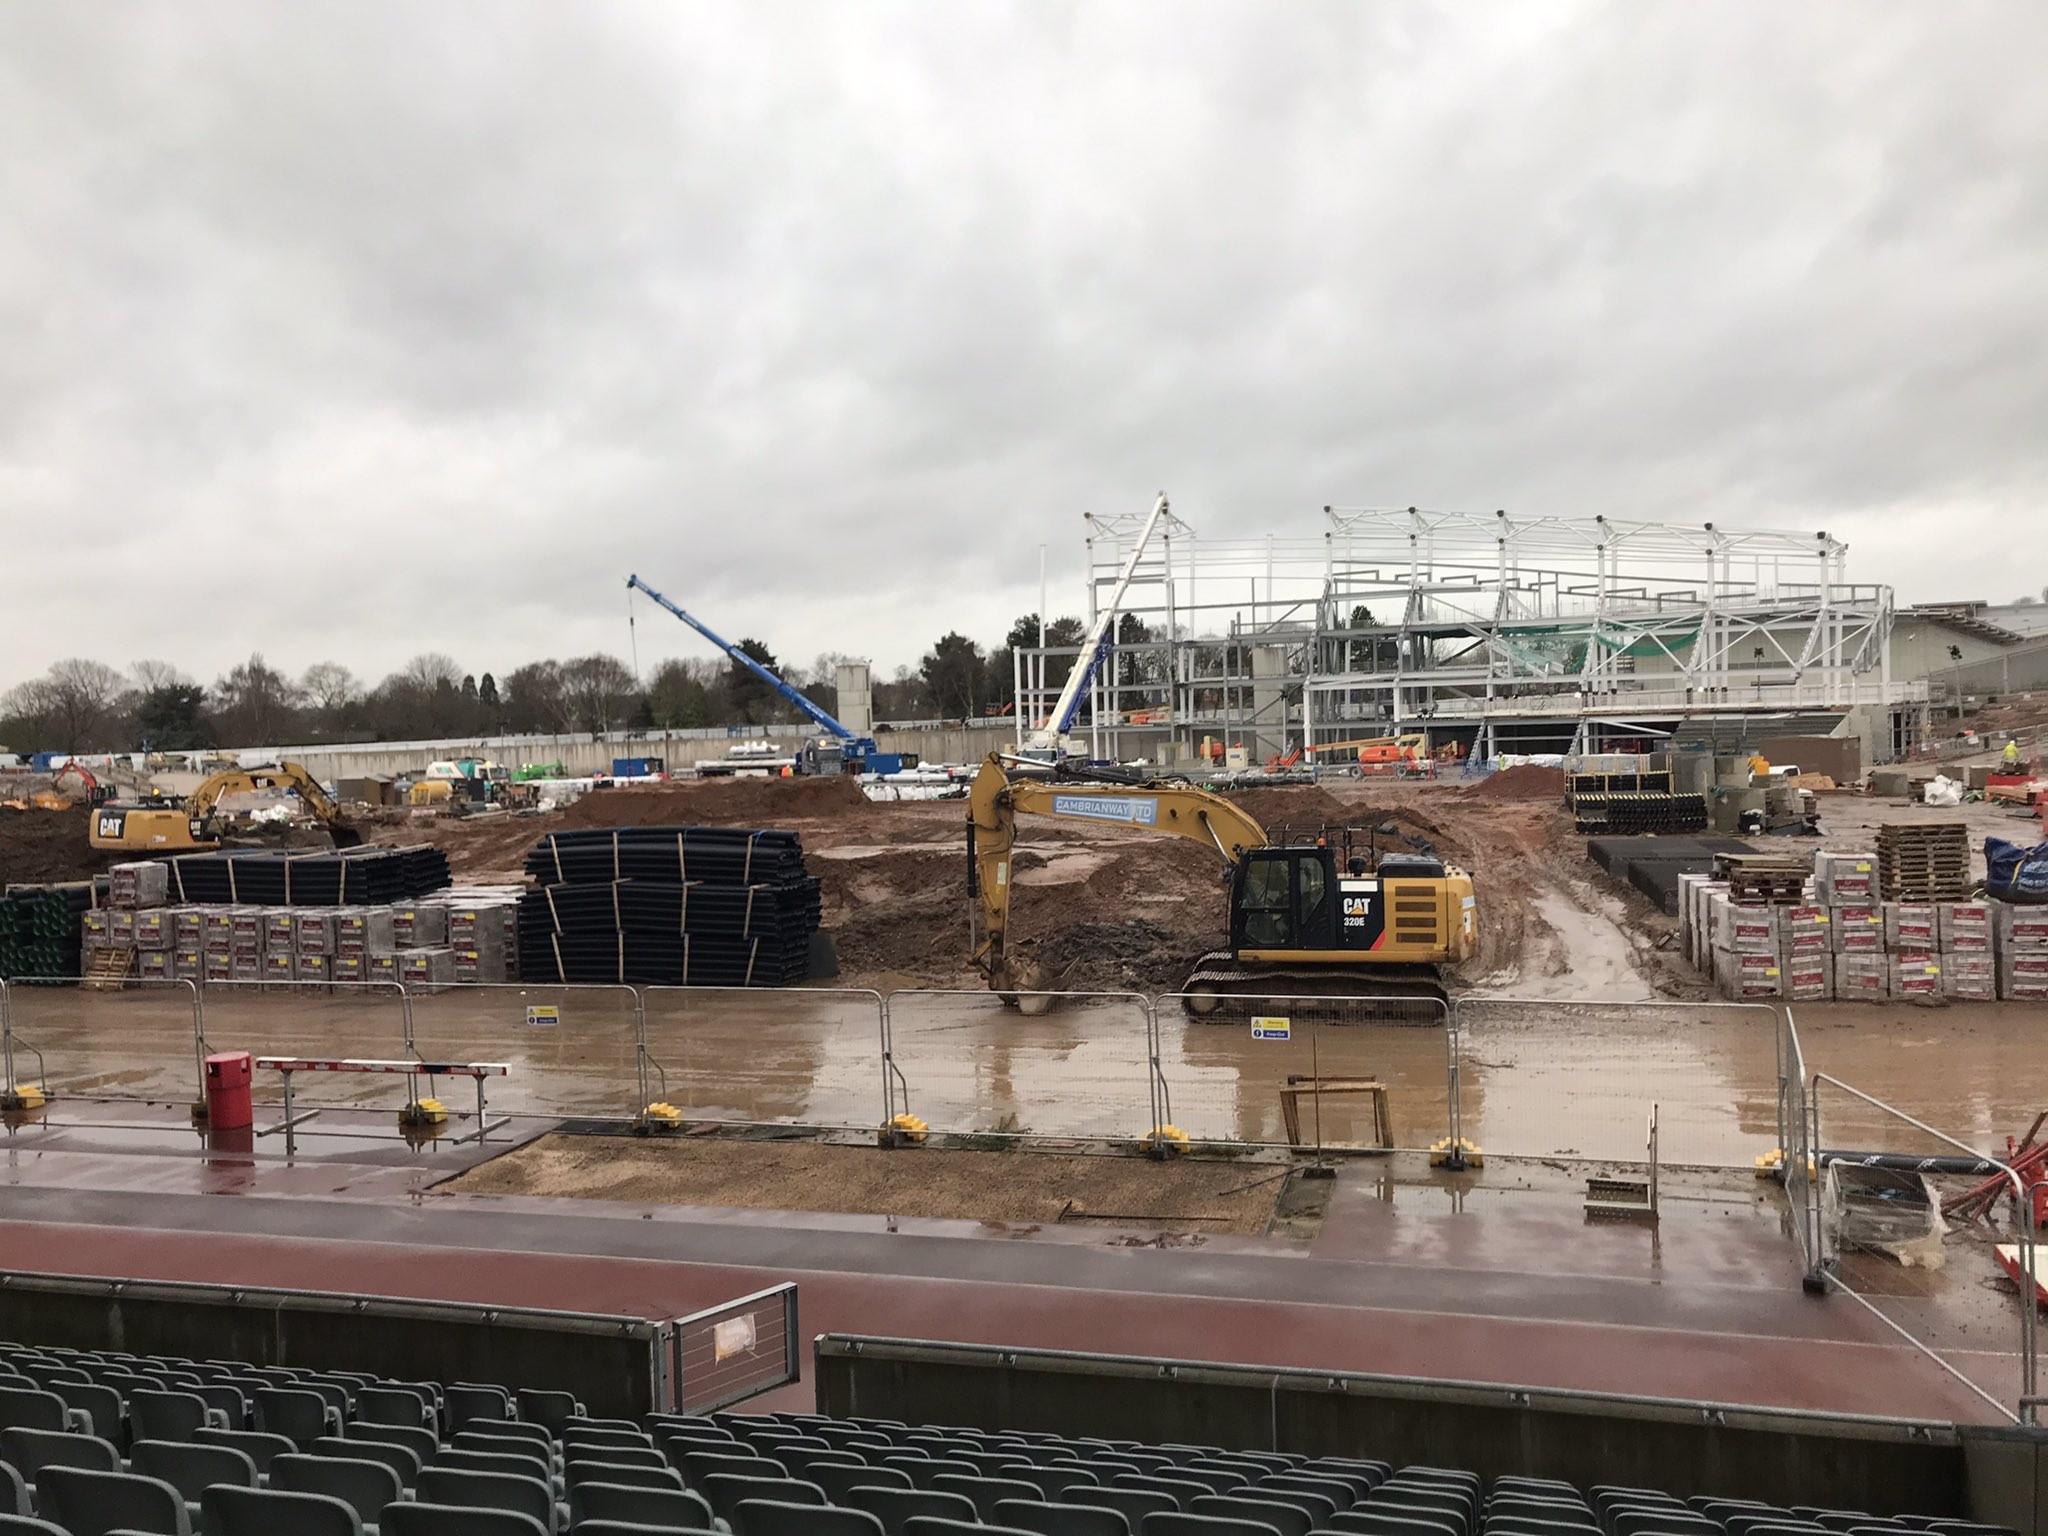 Alexander Stadium revamp on time and on budget, Birmingham 2022 chief boasts